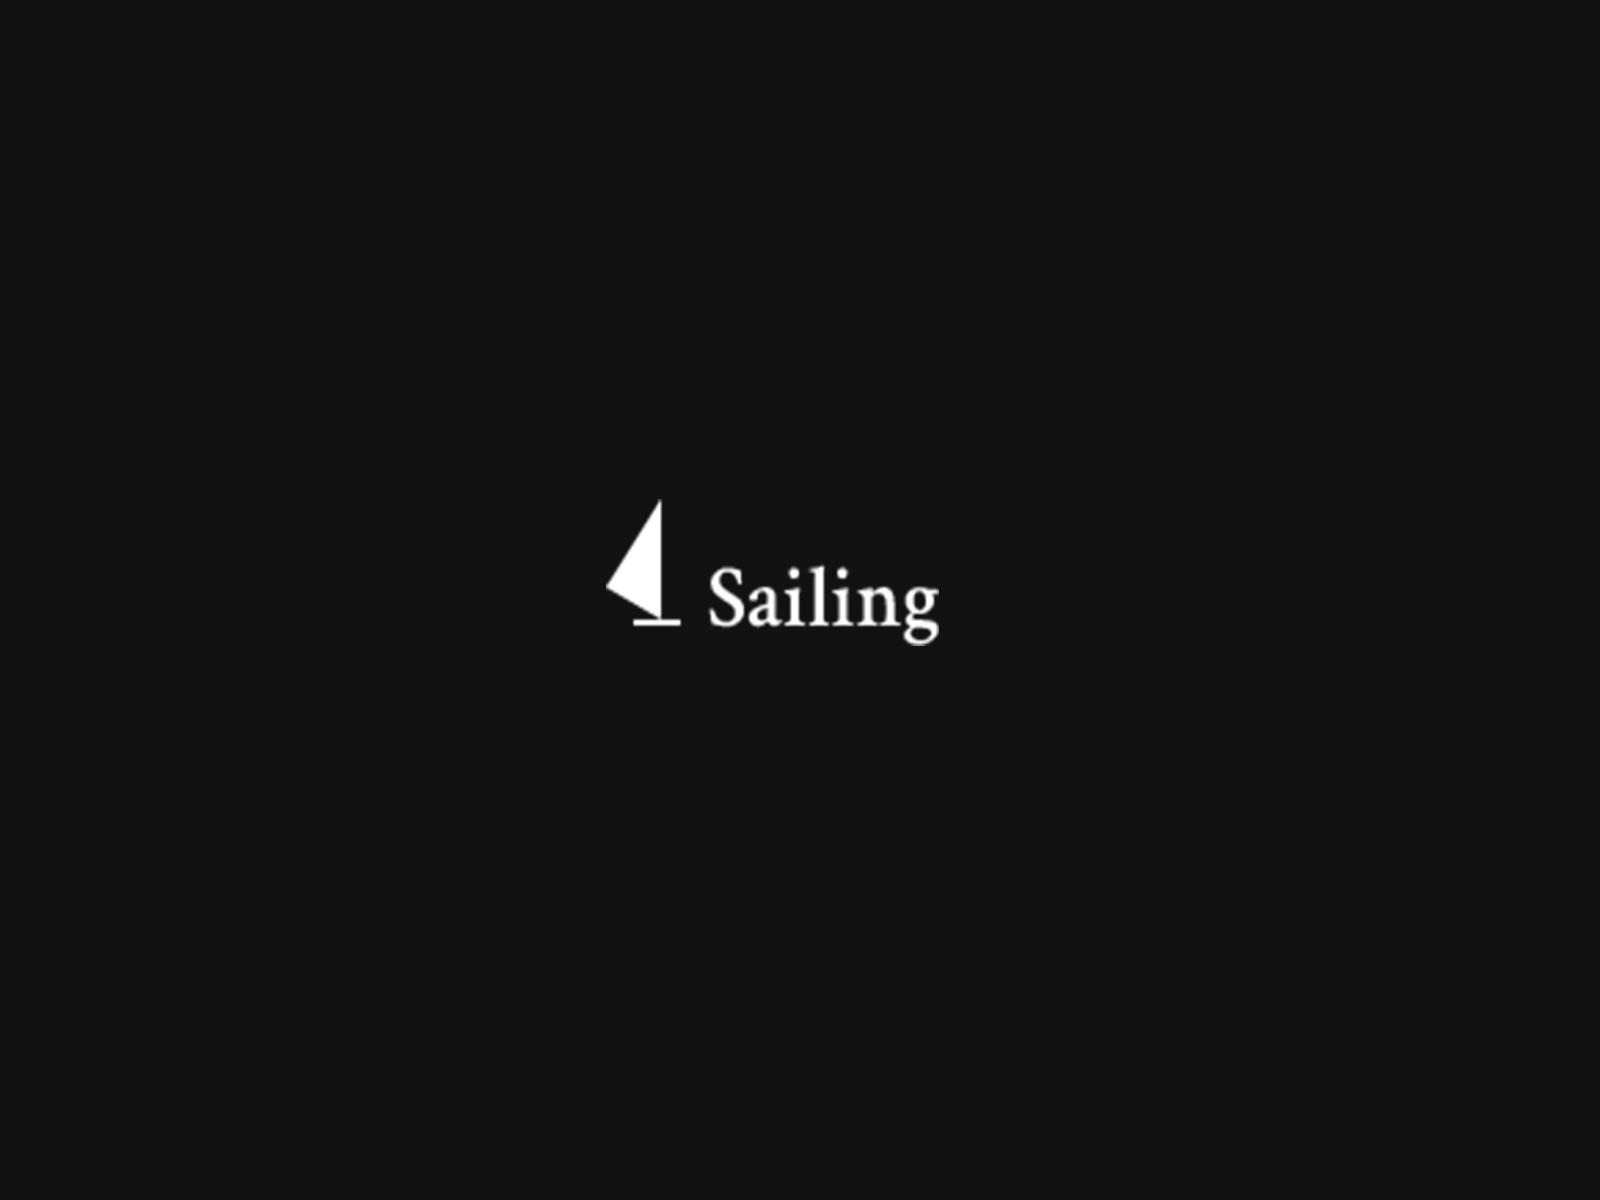 sailing logo